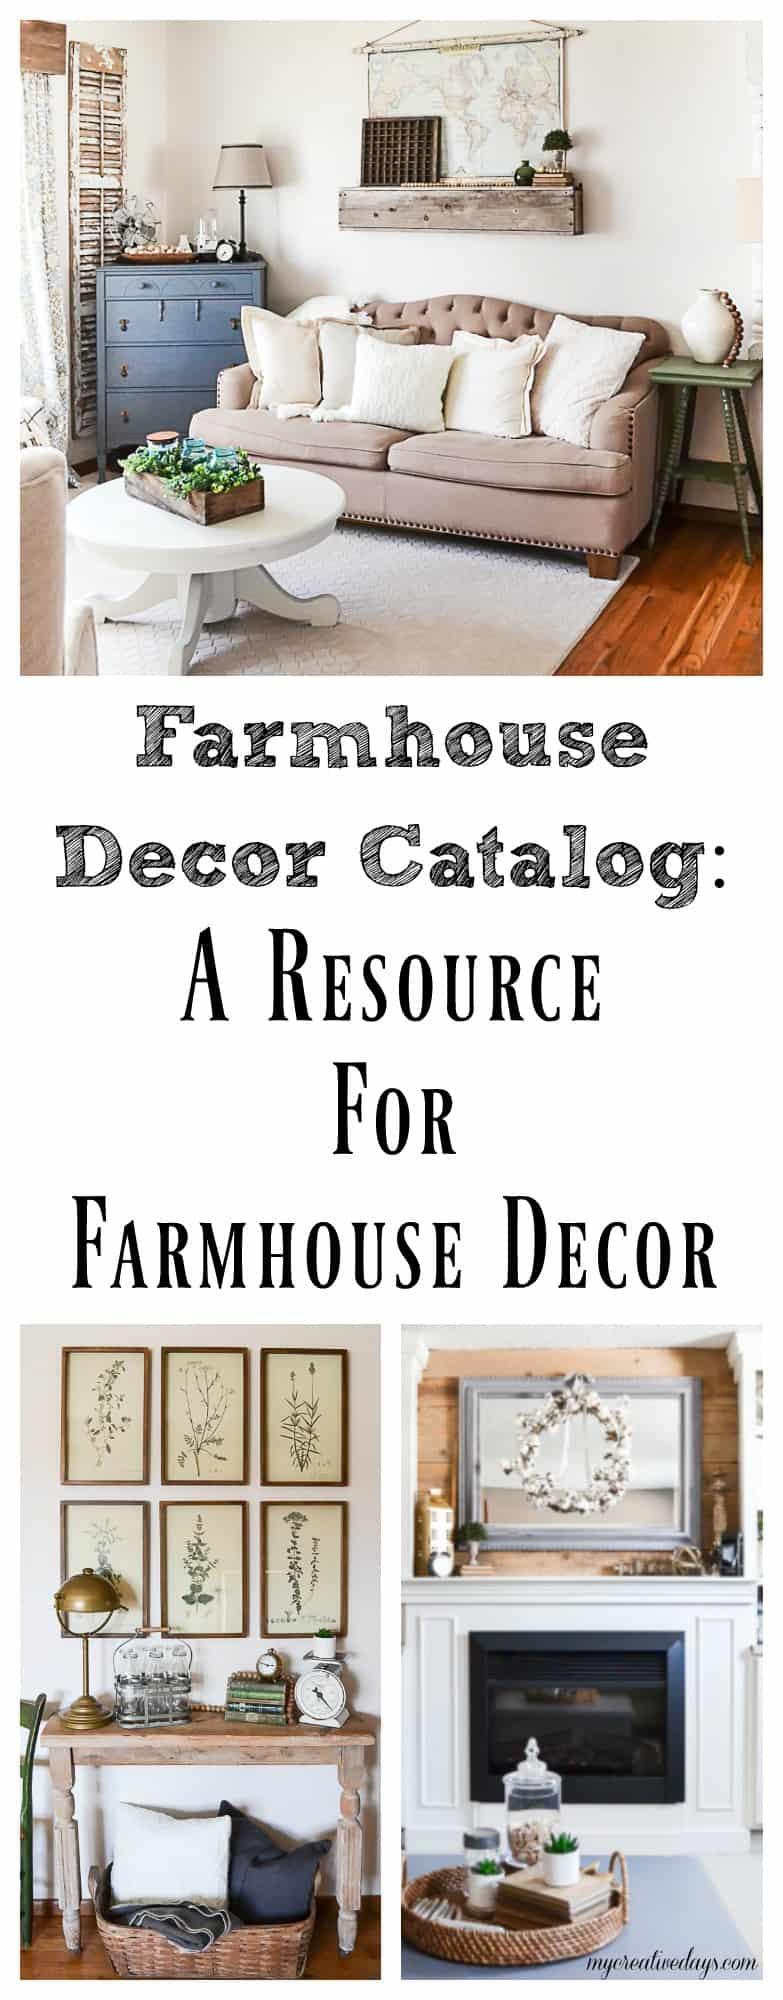 Farmhouse Decor Catalog